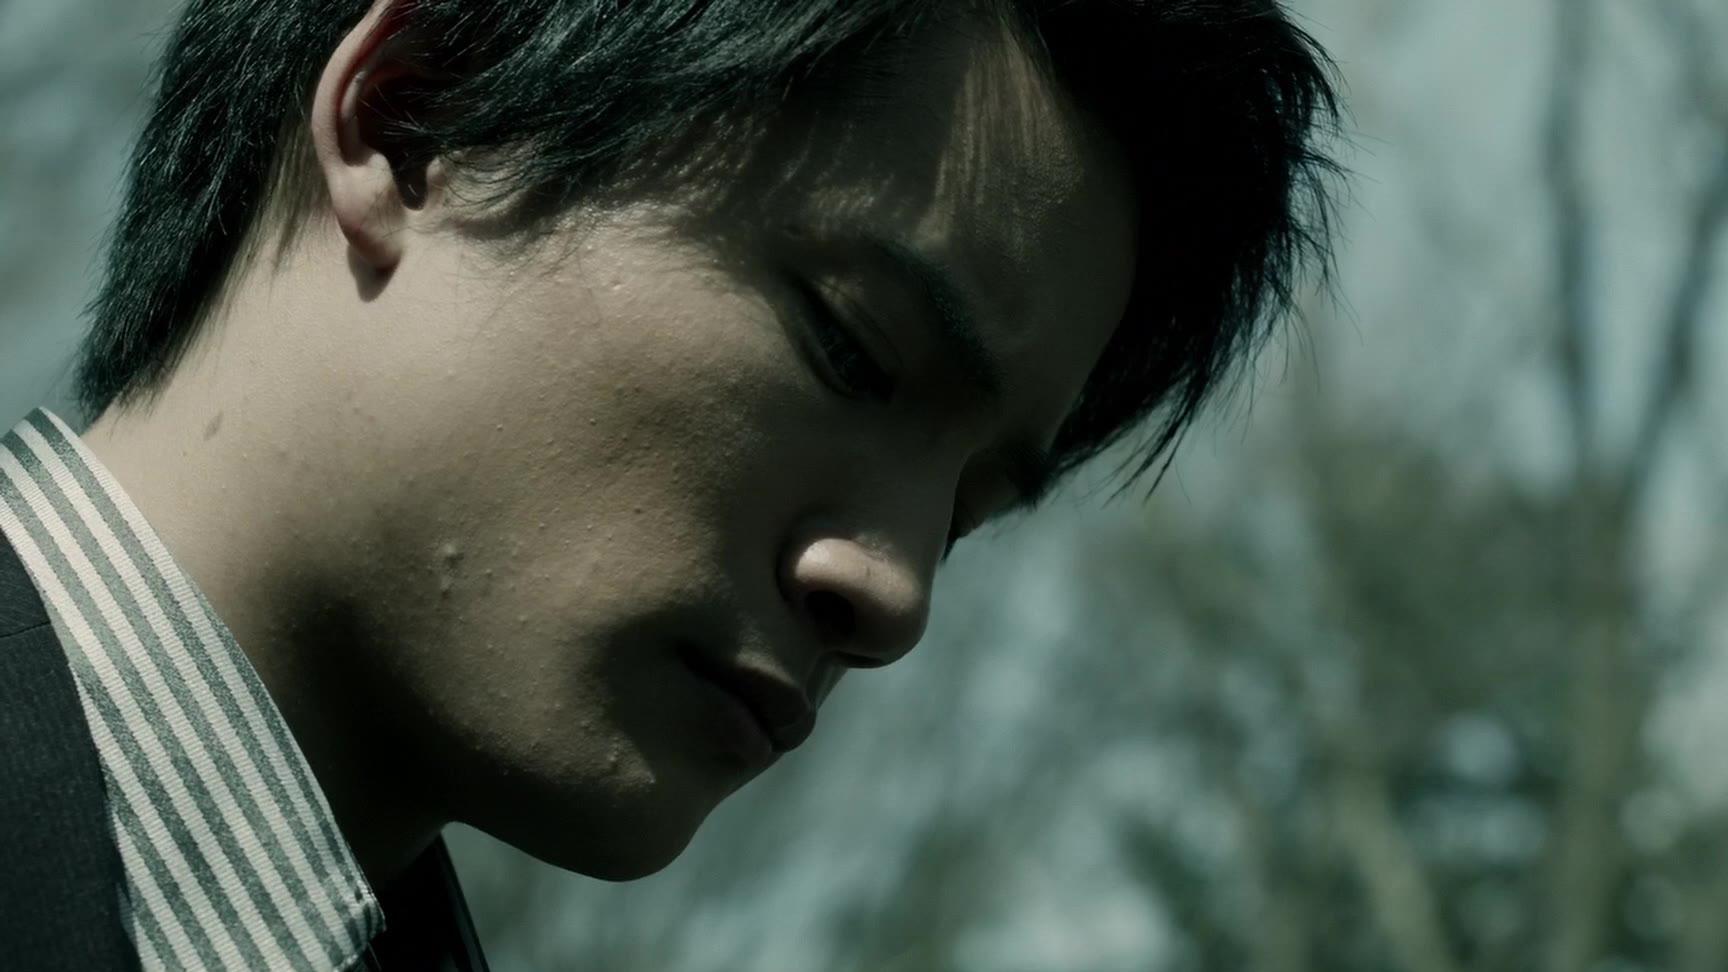 【特效字幕】假面骑士Amazons Sigma/NEO